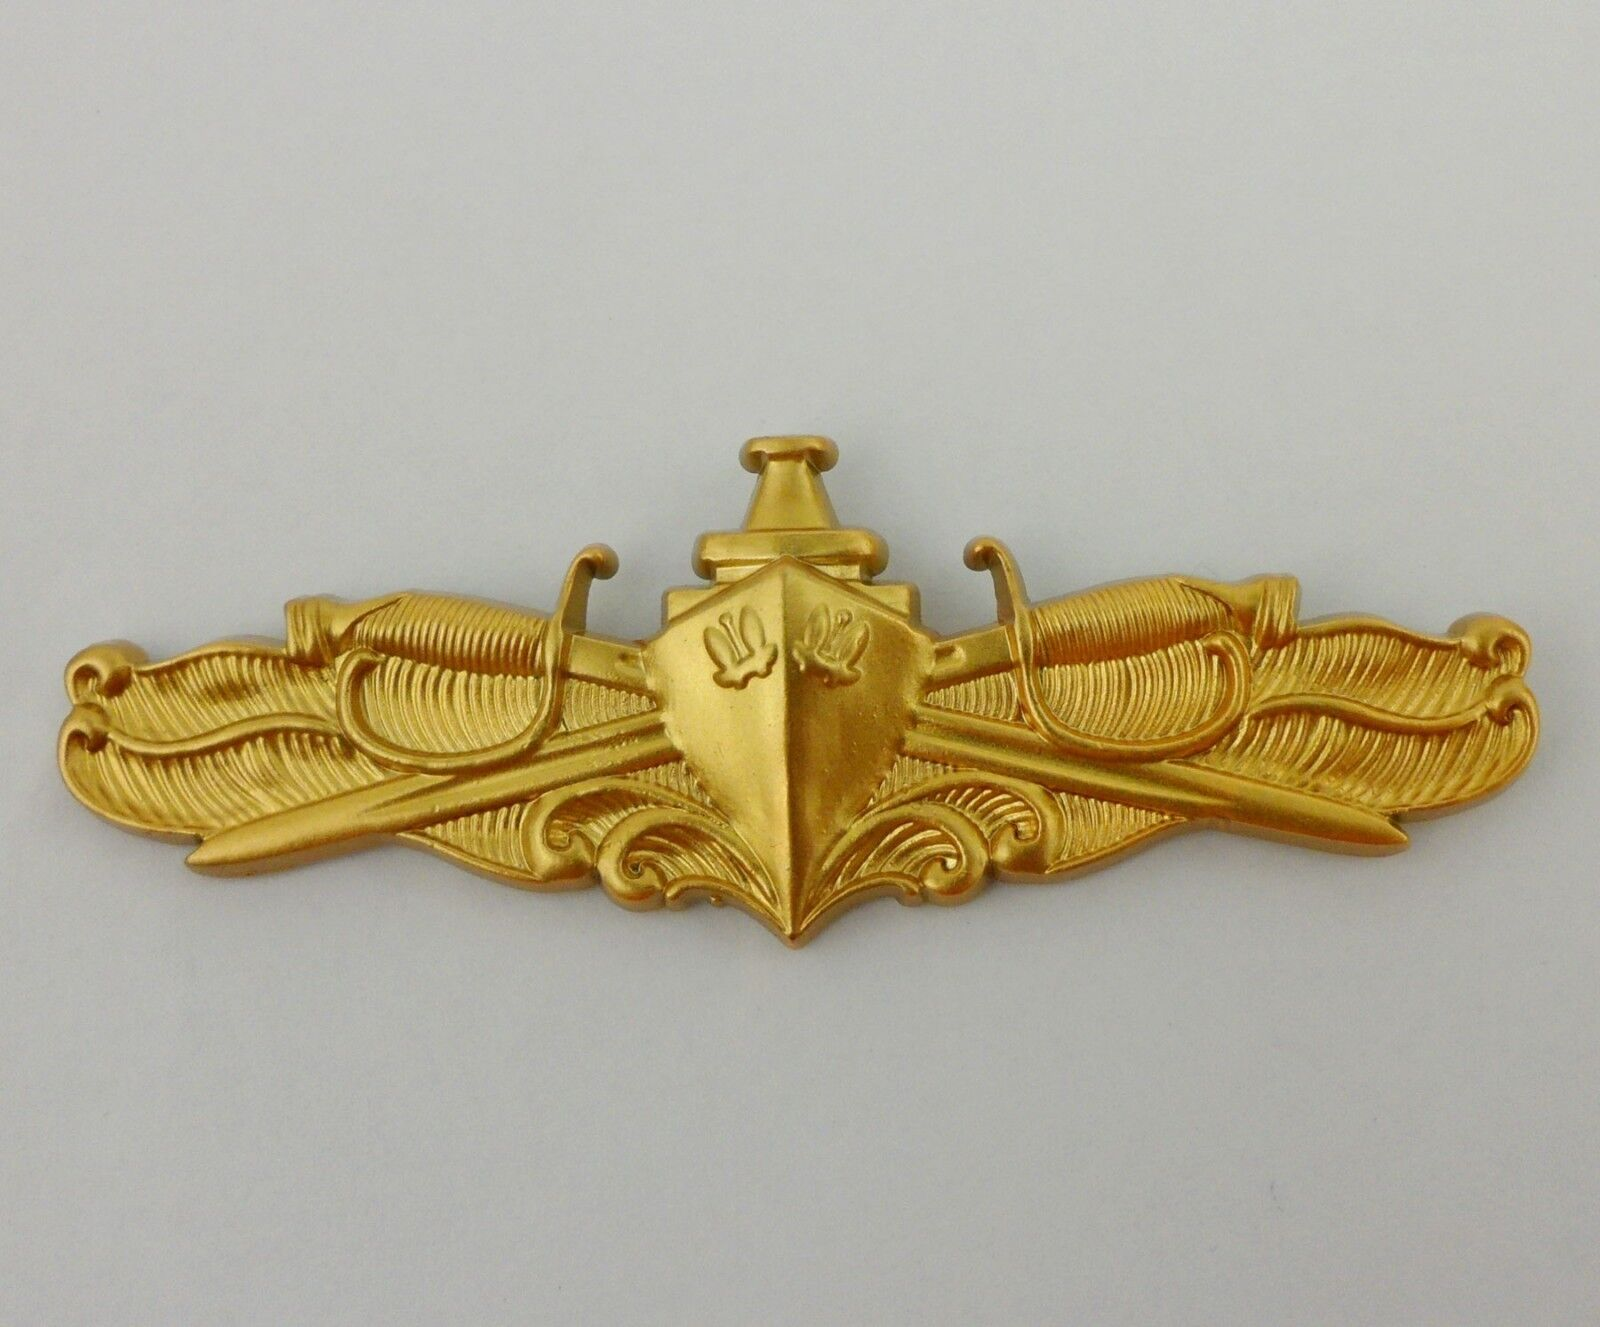 Mini Genuine U.S NAVY BADGE SURFACE WARFARE MEDICAL Gold Badge Pin Insignia